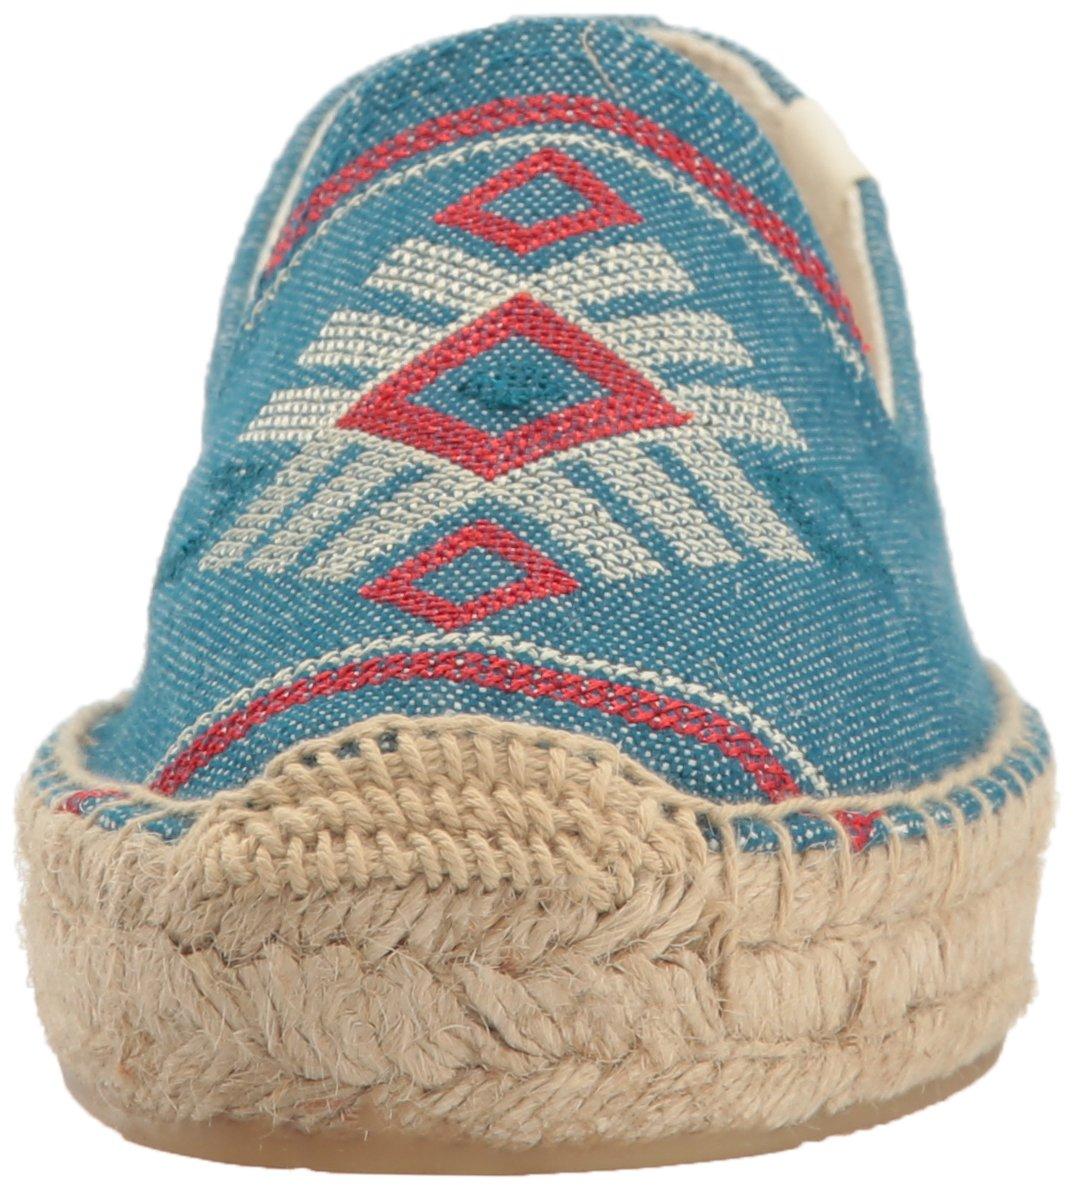 Soludos B01N8P71S2 Women's Yucatan Smoking Slipper Flat B01N8P71S2 Soludos 10 B(M) US|Ocean Blue ccc76c